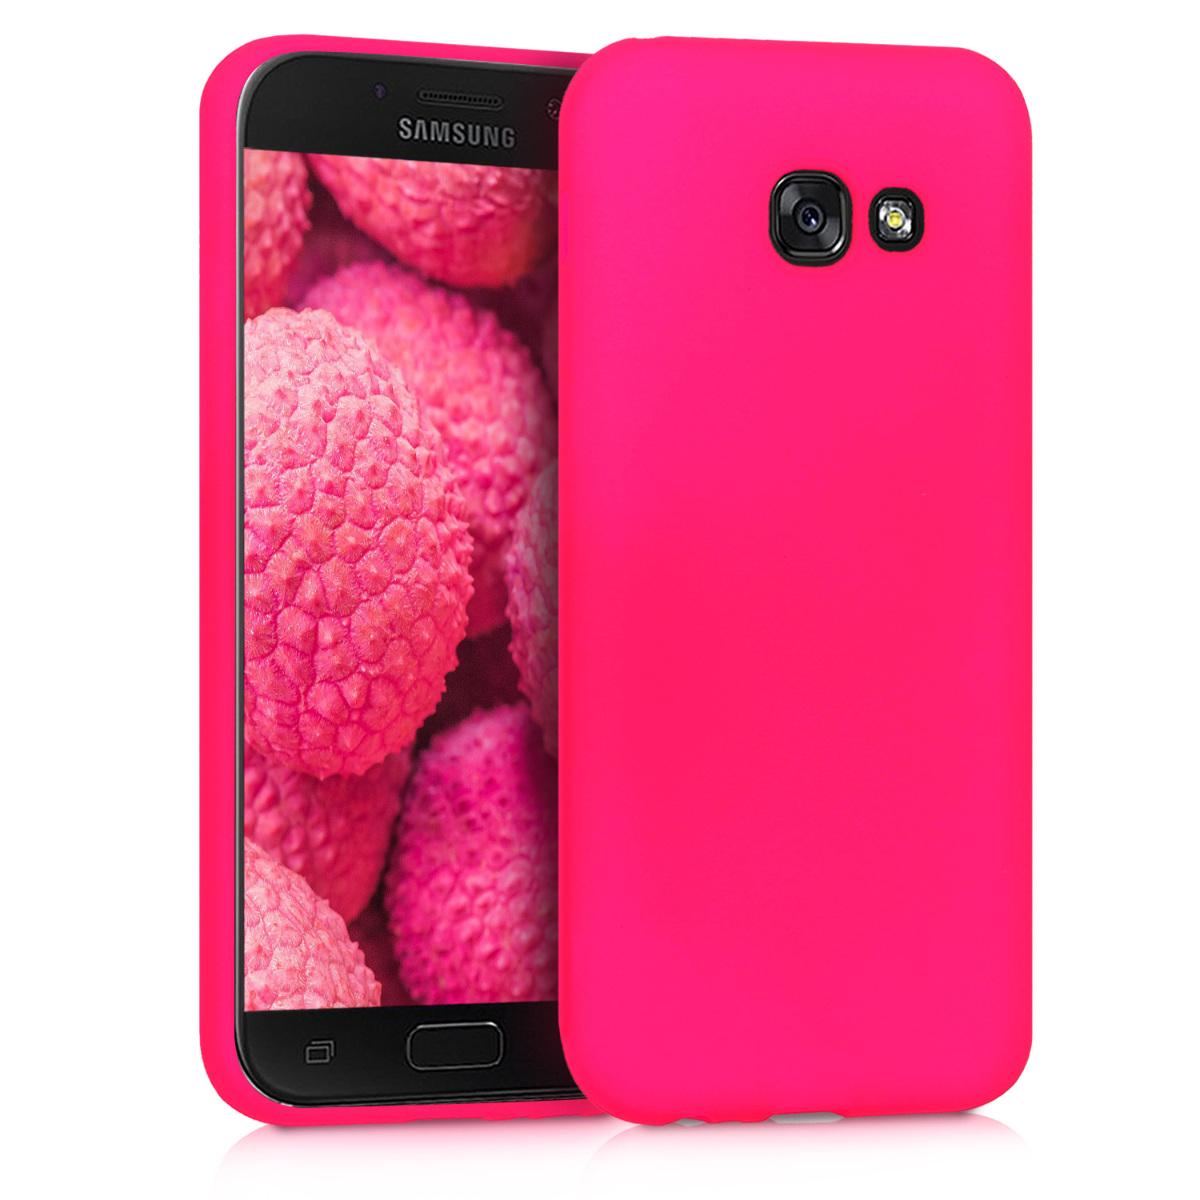 KW Θήκη Σιλικόνης Samsung Galaxy A5 (2017) - Soft Flexible Shock Absorbent - Neon Pink (44074.77)